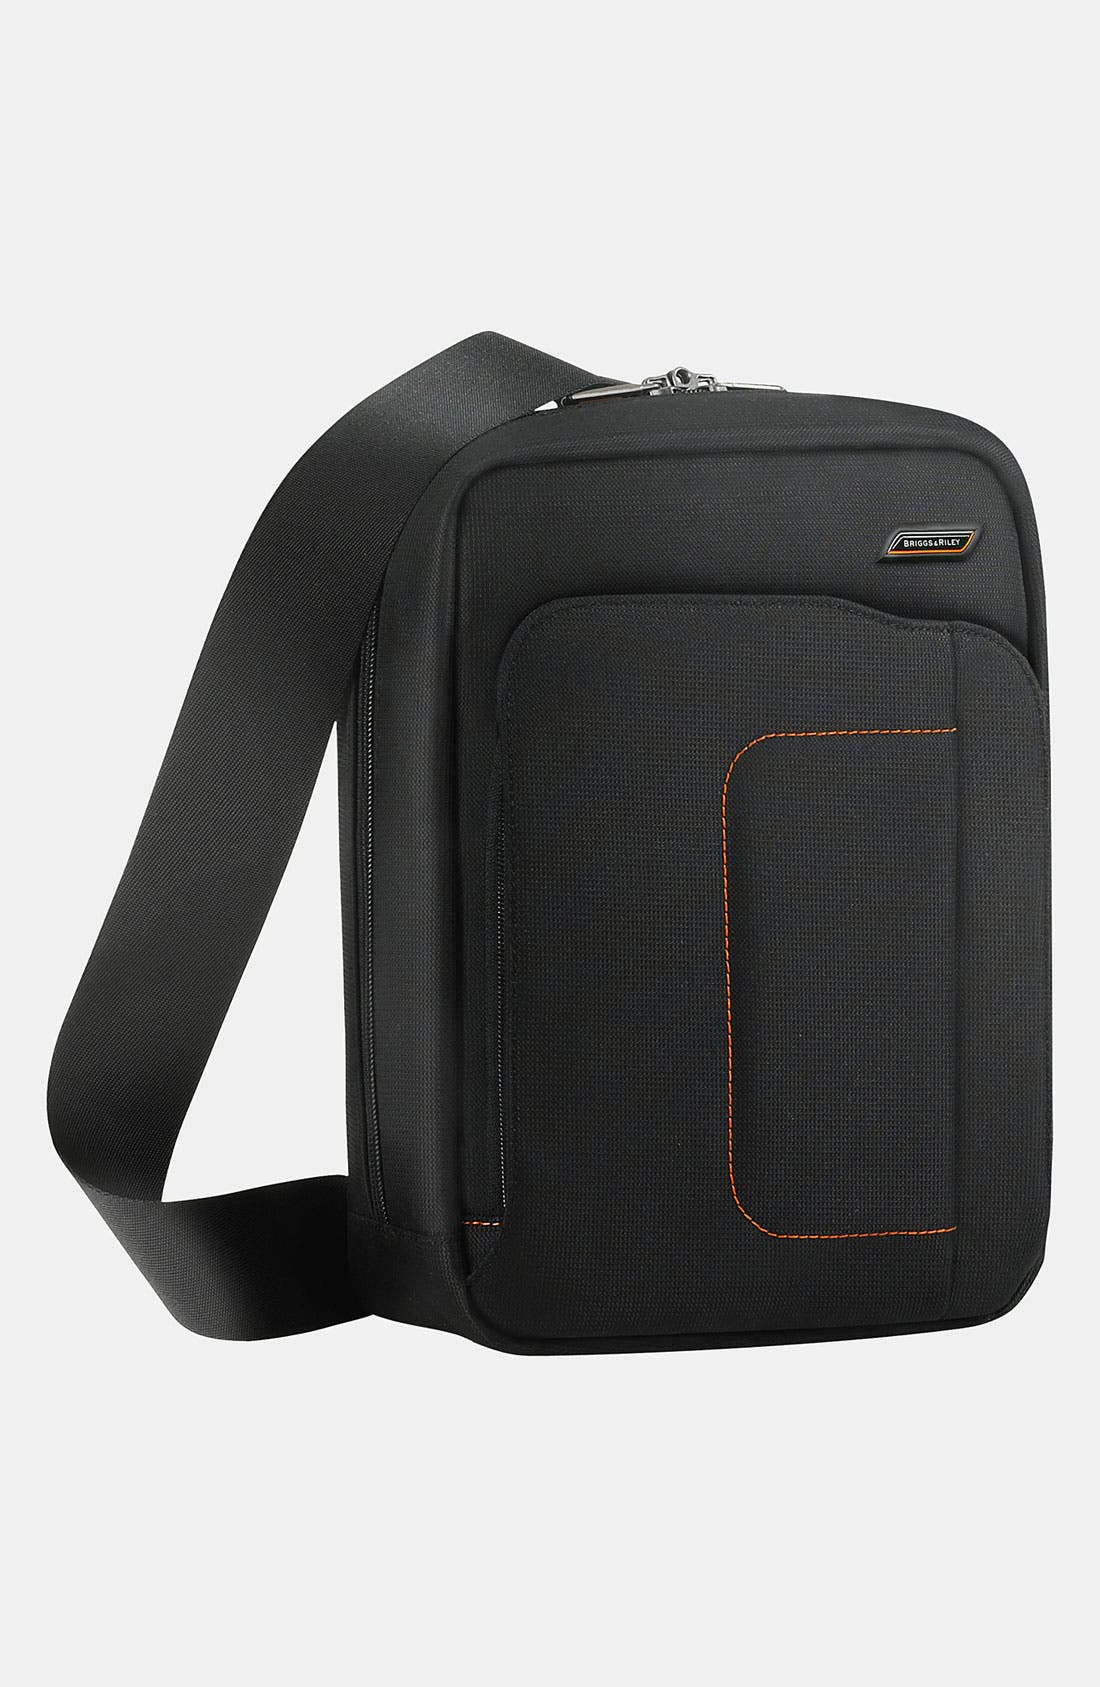 Alternate Image 1 Selected - Briggs & Riley 'Verb - Slide' Tech Bag